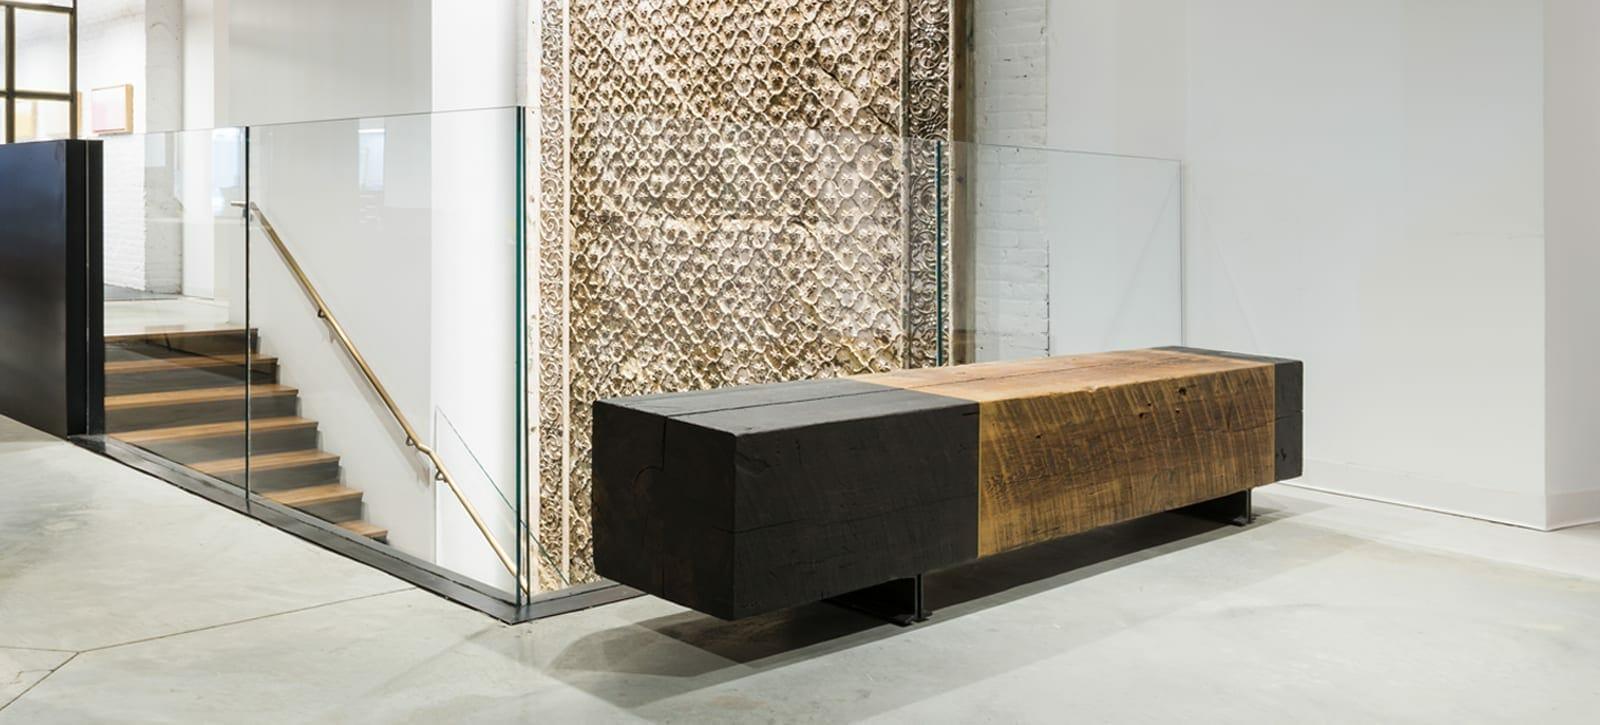 empire reclaimed heart pine bench